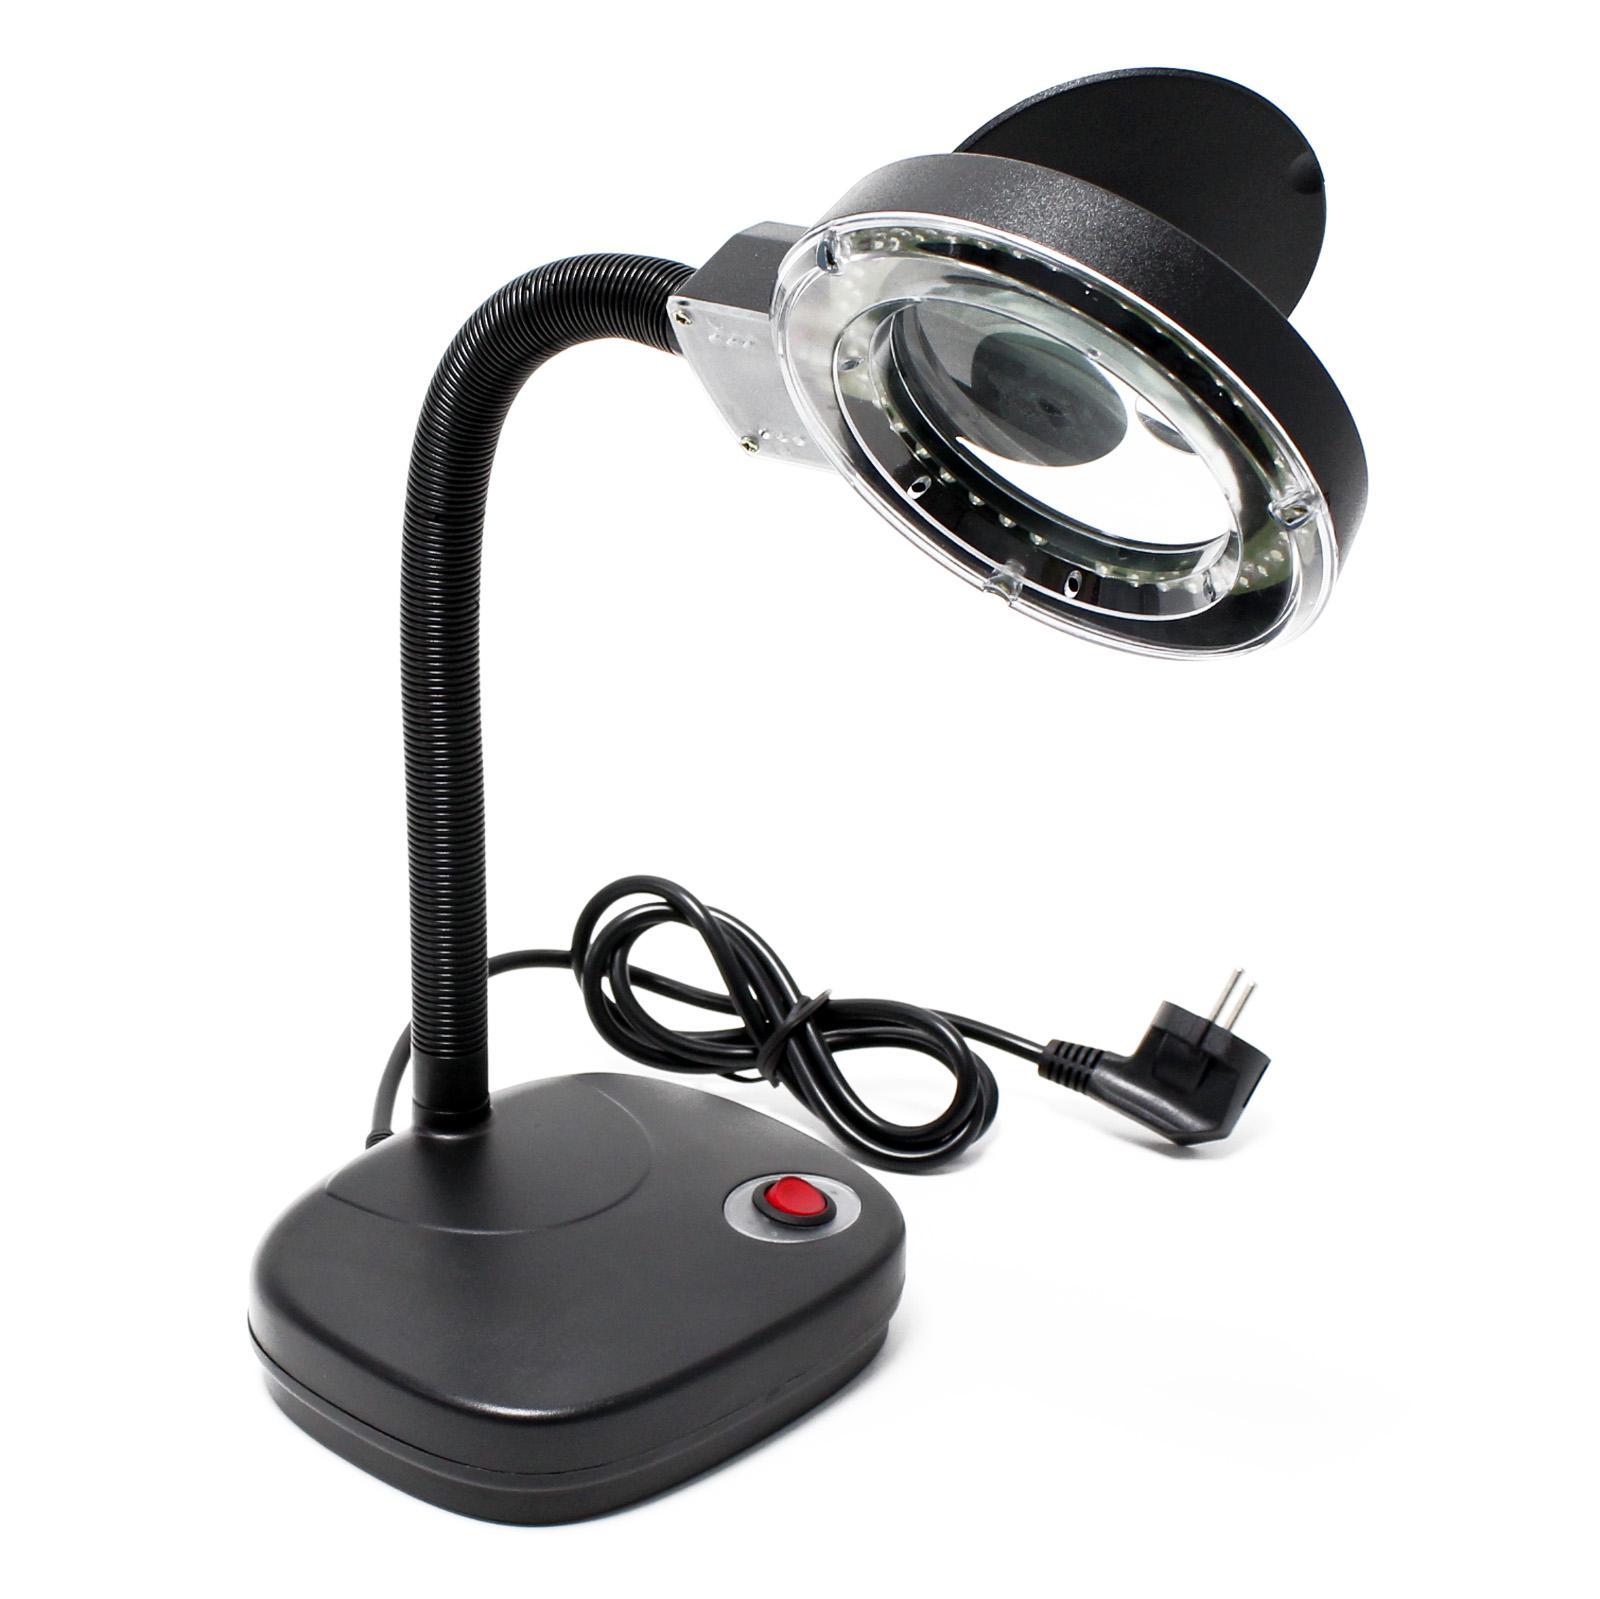 aoyue 927 led lupenlampe arbeitslampe lupe kaufen bei wiltec wildanger technik gmbh. Black Bedroom Furniture Sets. Home Design Ideas